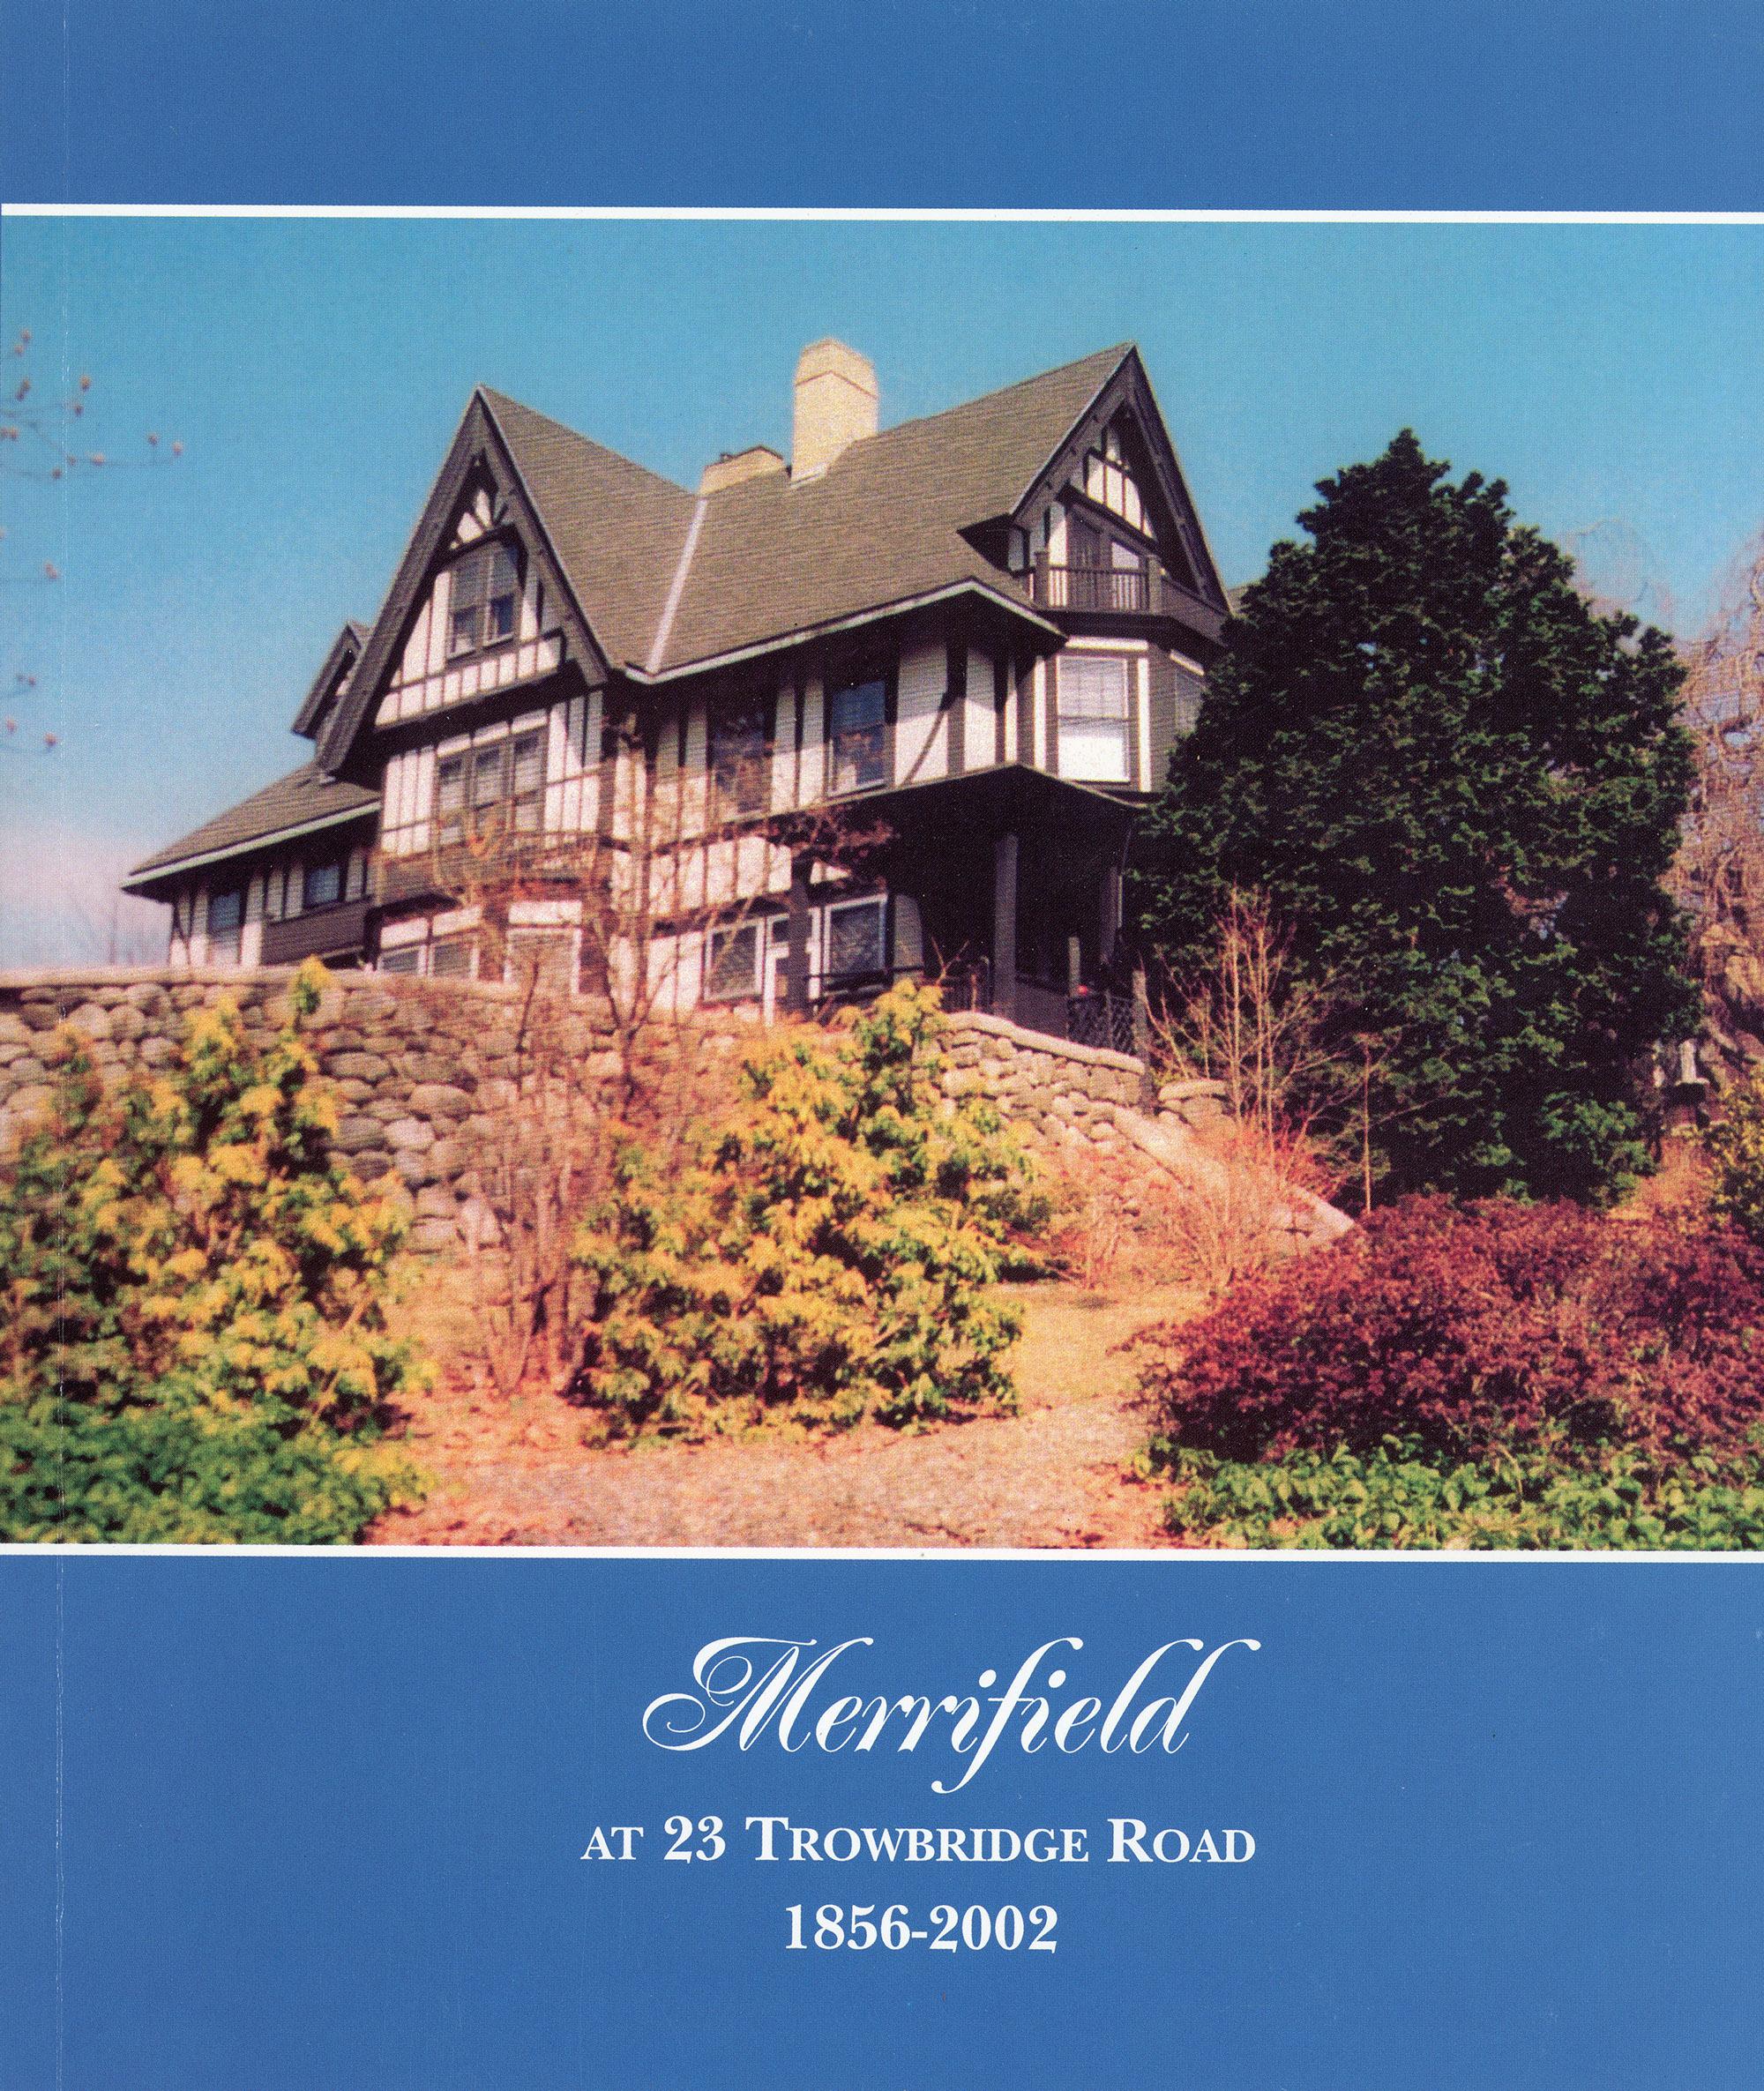 Merrifield at 23 Trowbridge Road by Worcester Historical Museum